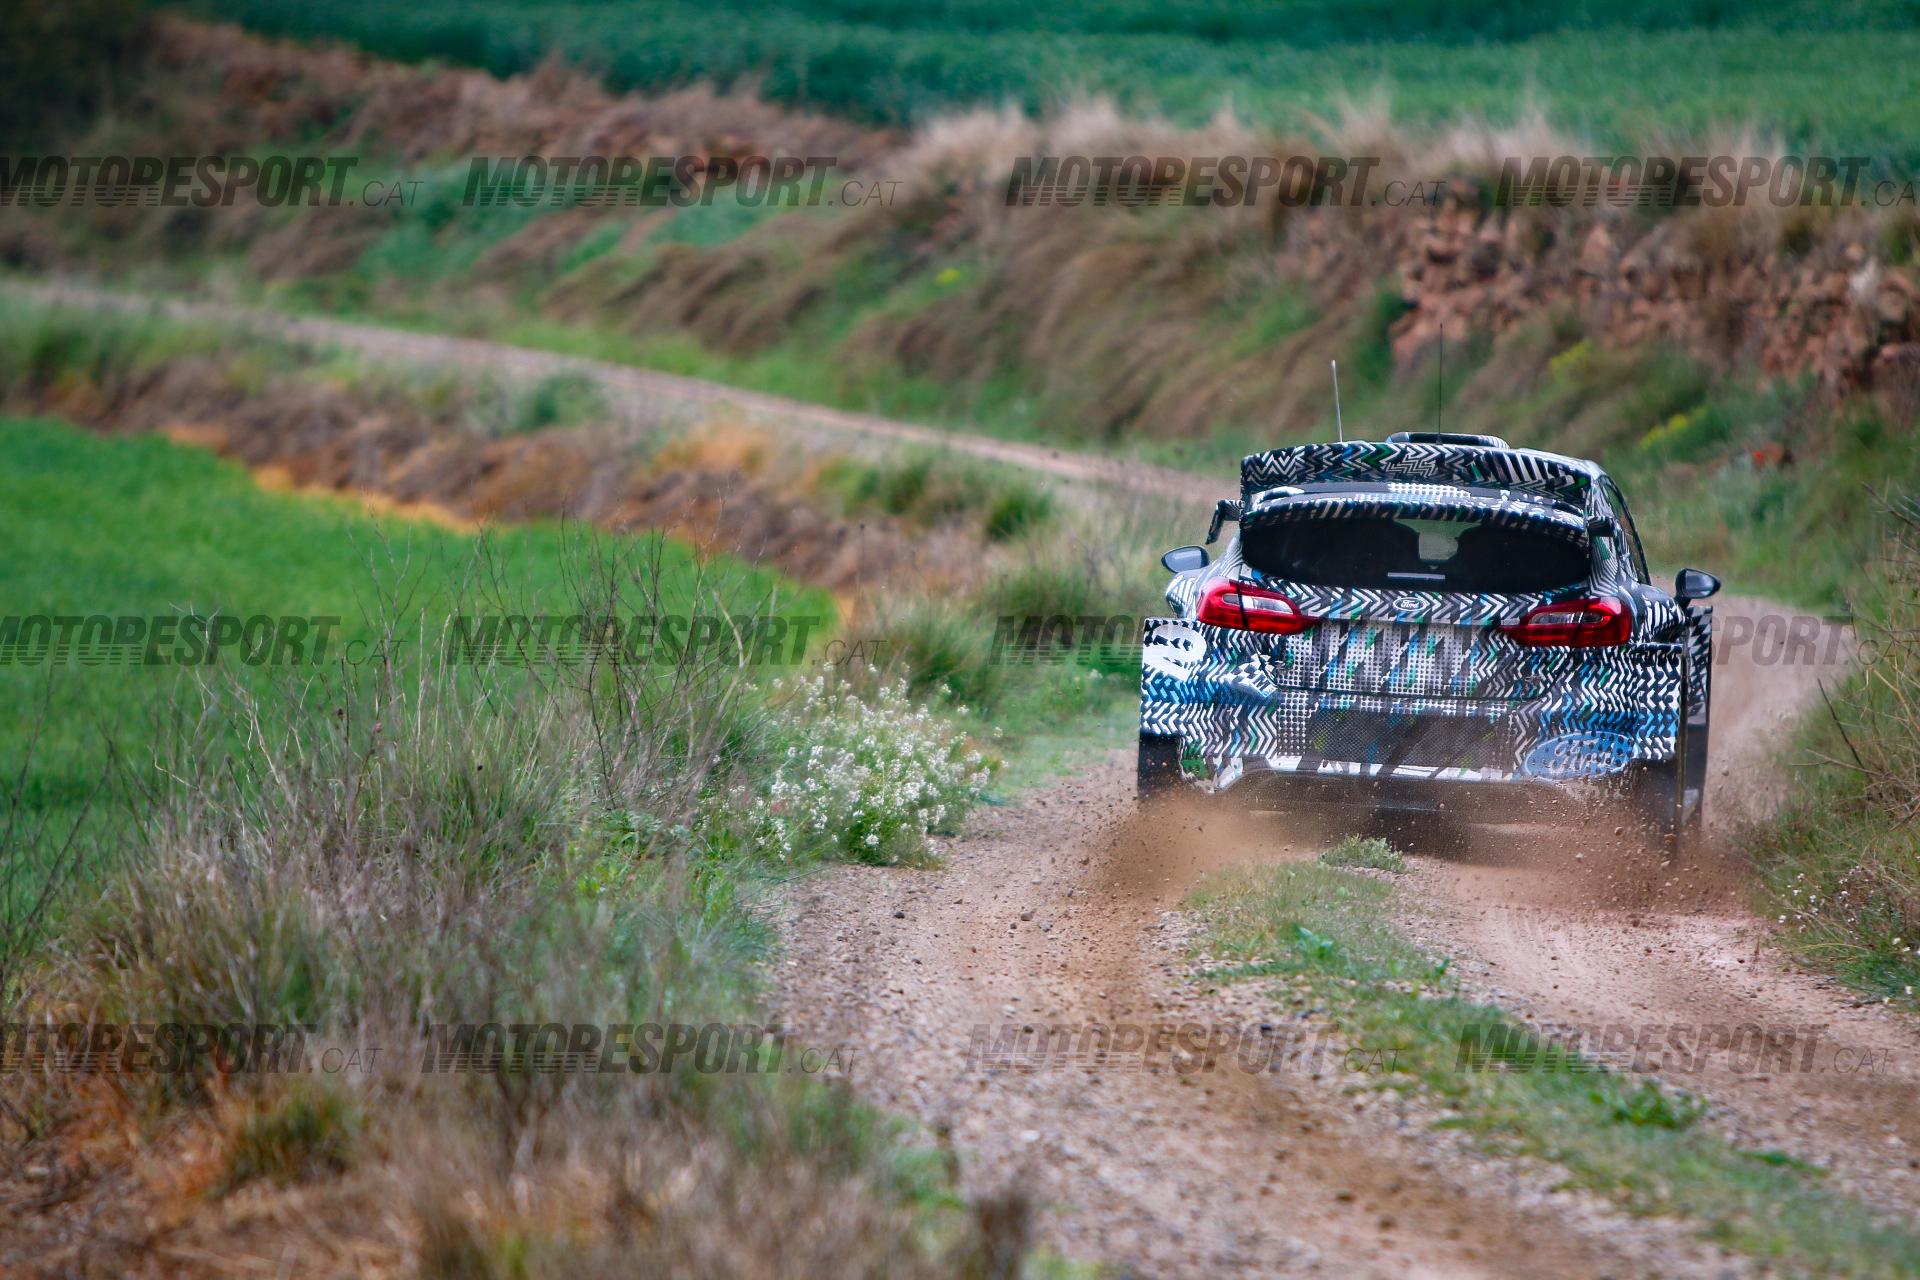 World Rally Championship: Temporada 2021  - Página 23 Ez-G01zXsAAkrcS?format=jpg&name=large